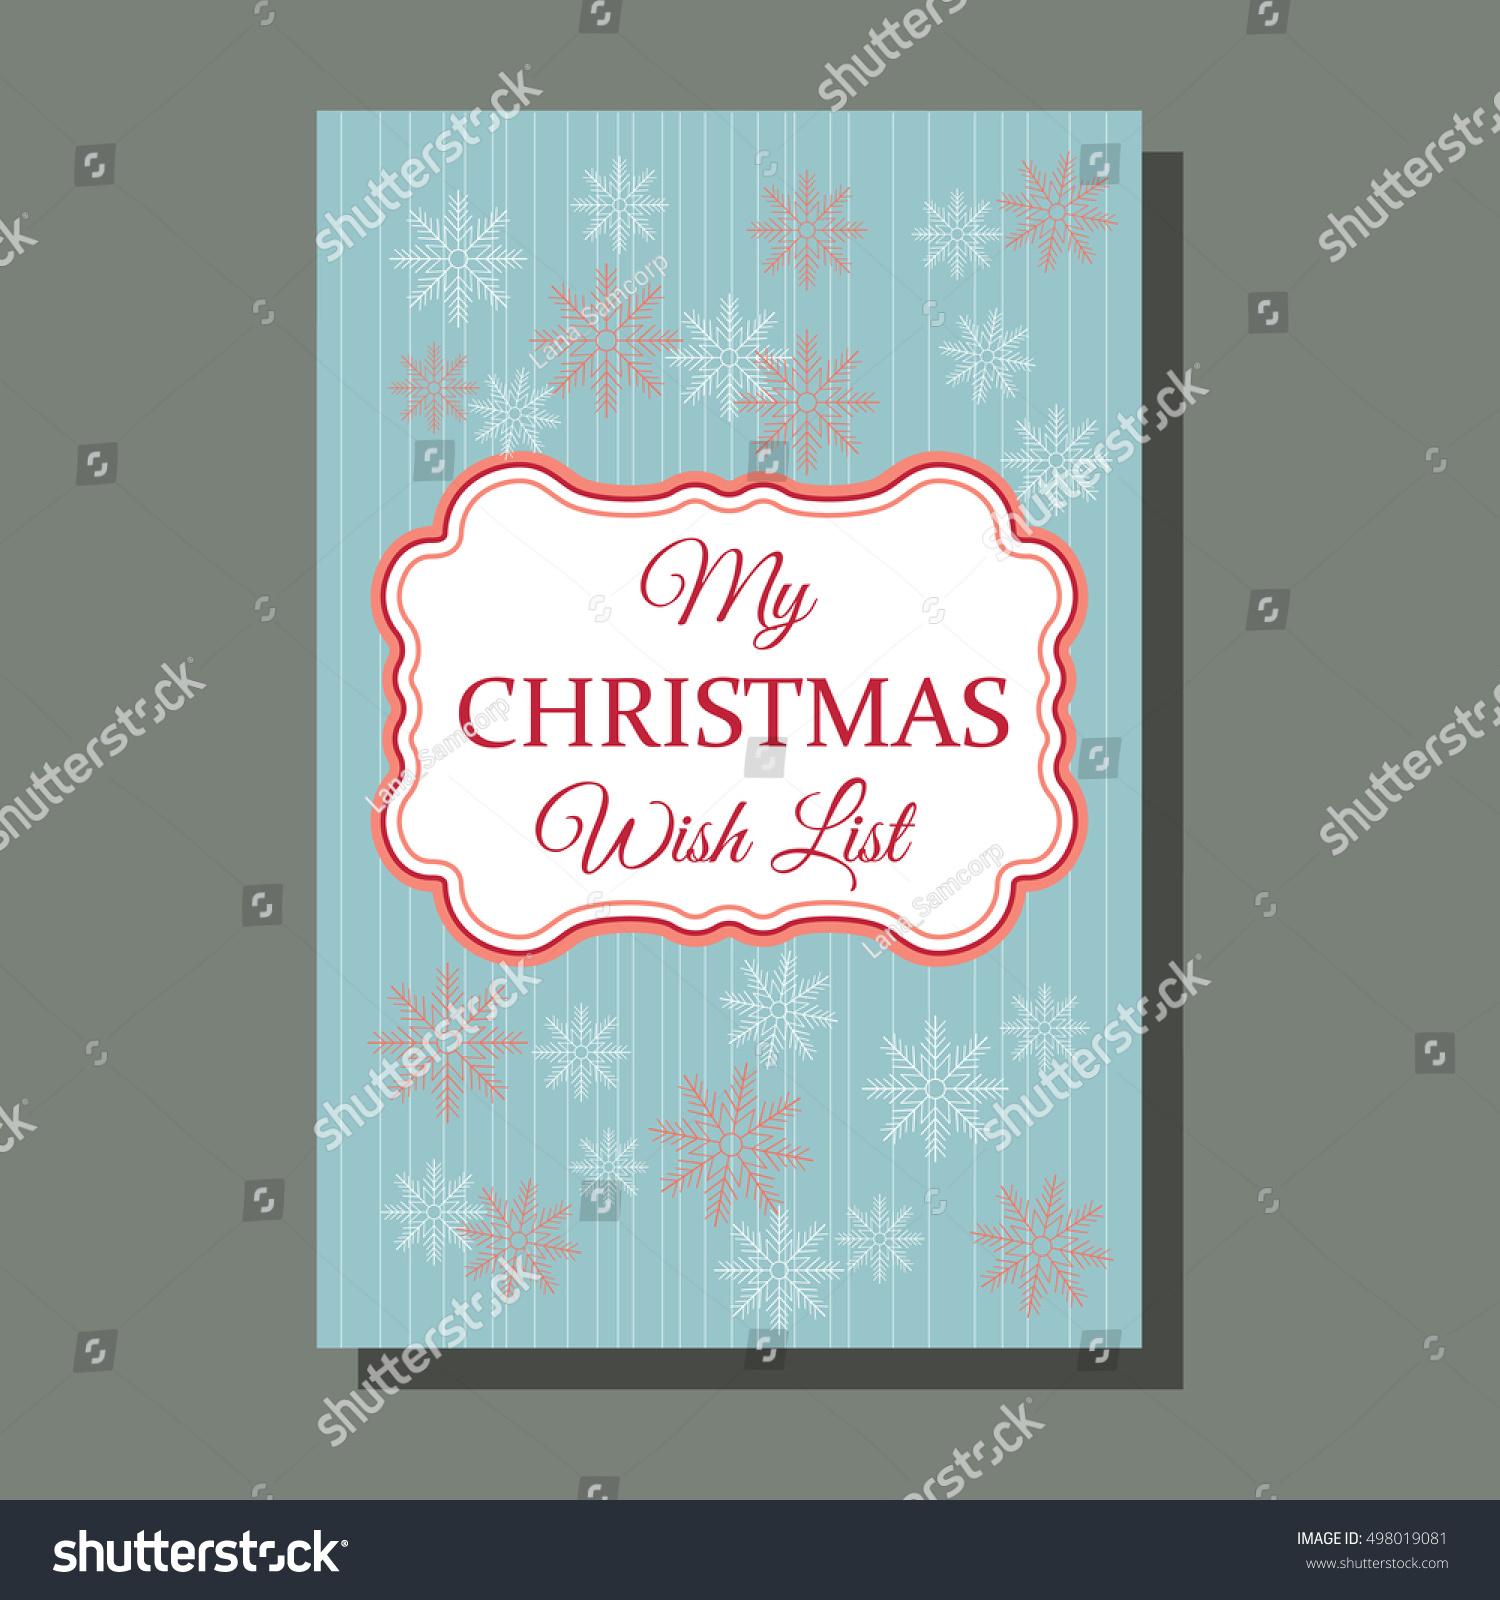 Christmas Card Holiday Season Greeting Concept Stock Vector Royalty